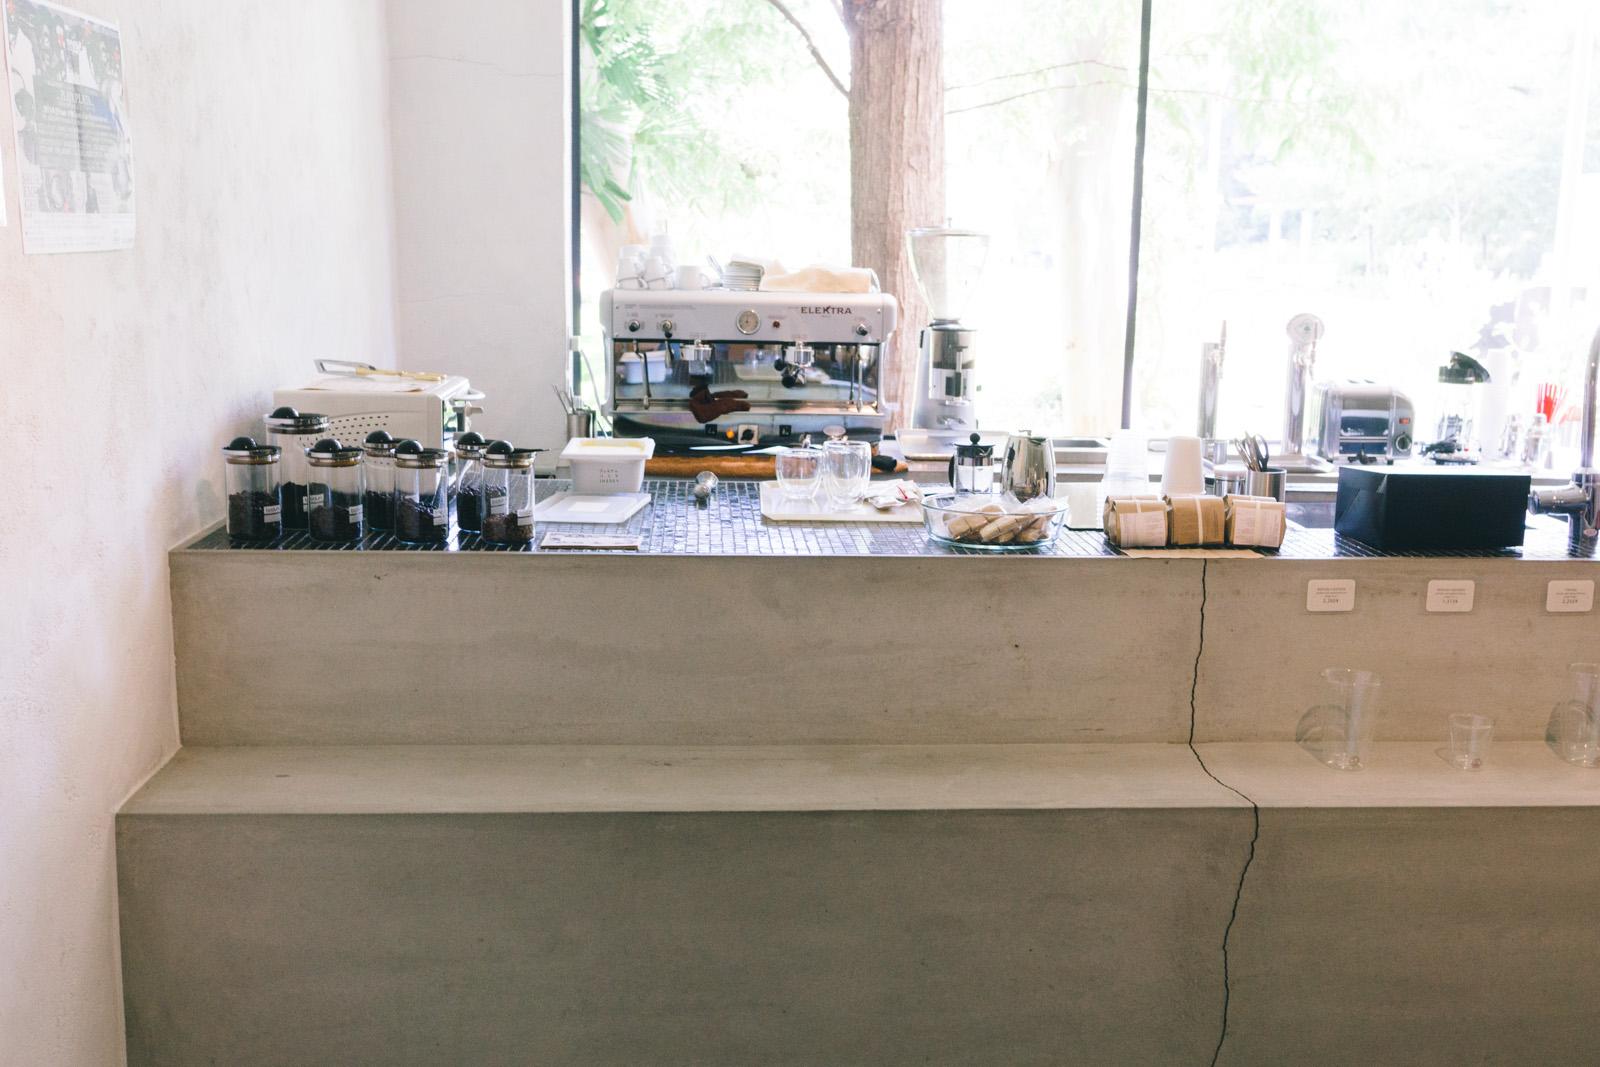 that-food-cray-osaka-japan-vade-vecvm-cafe-coffee-shop-5